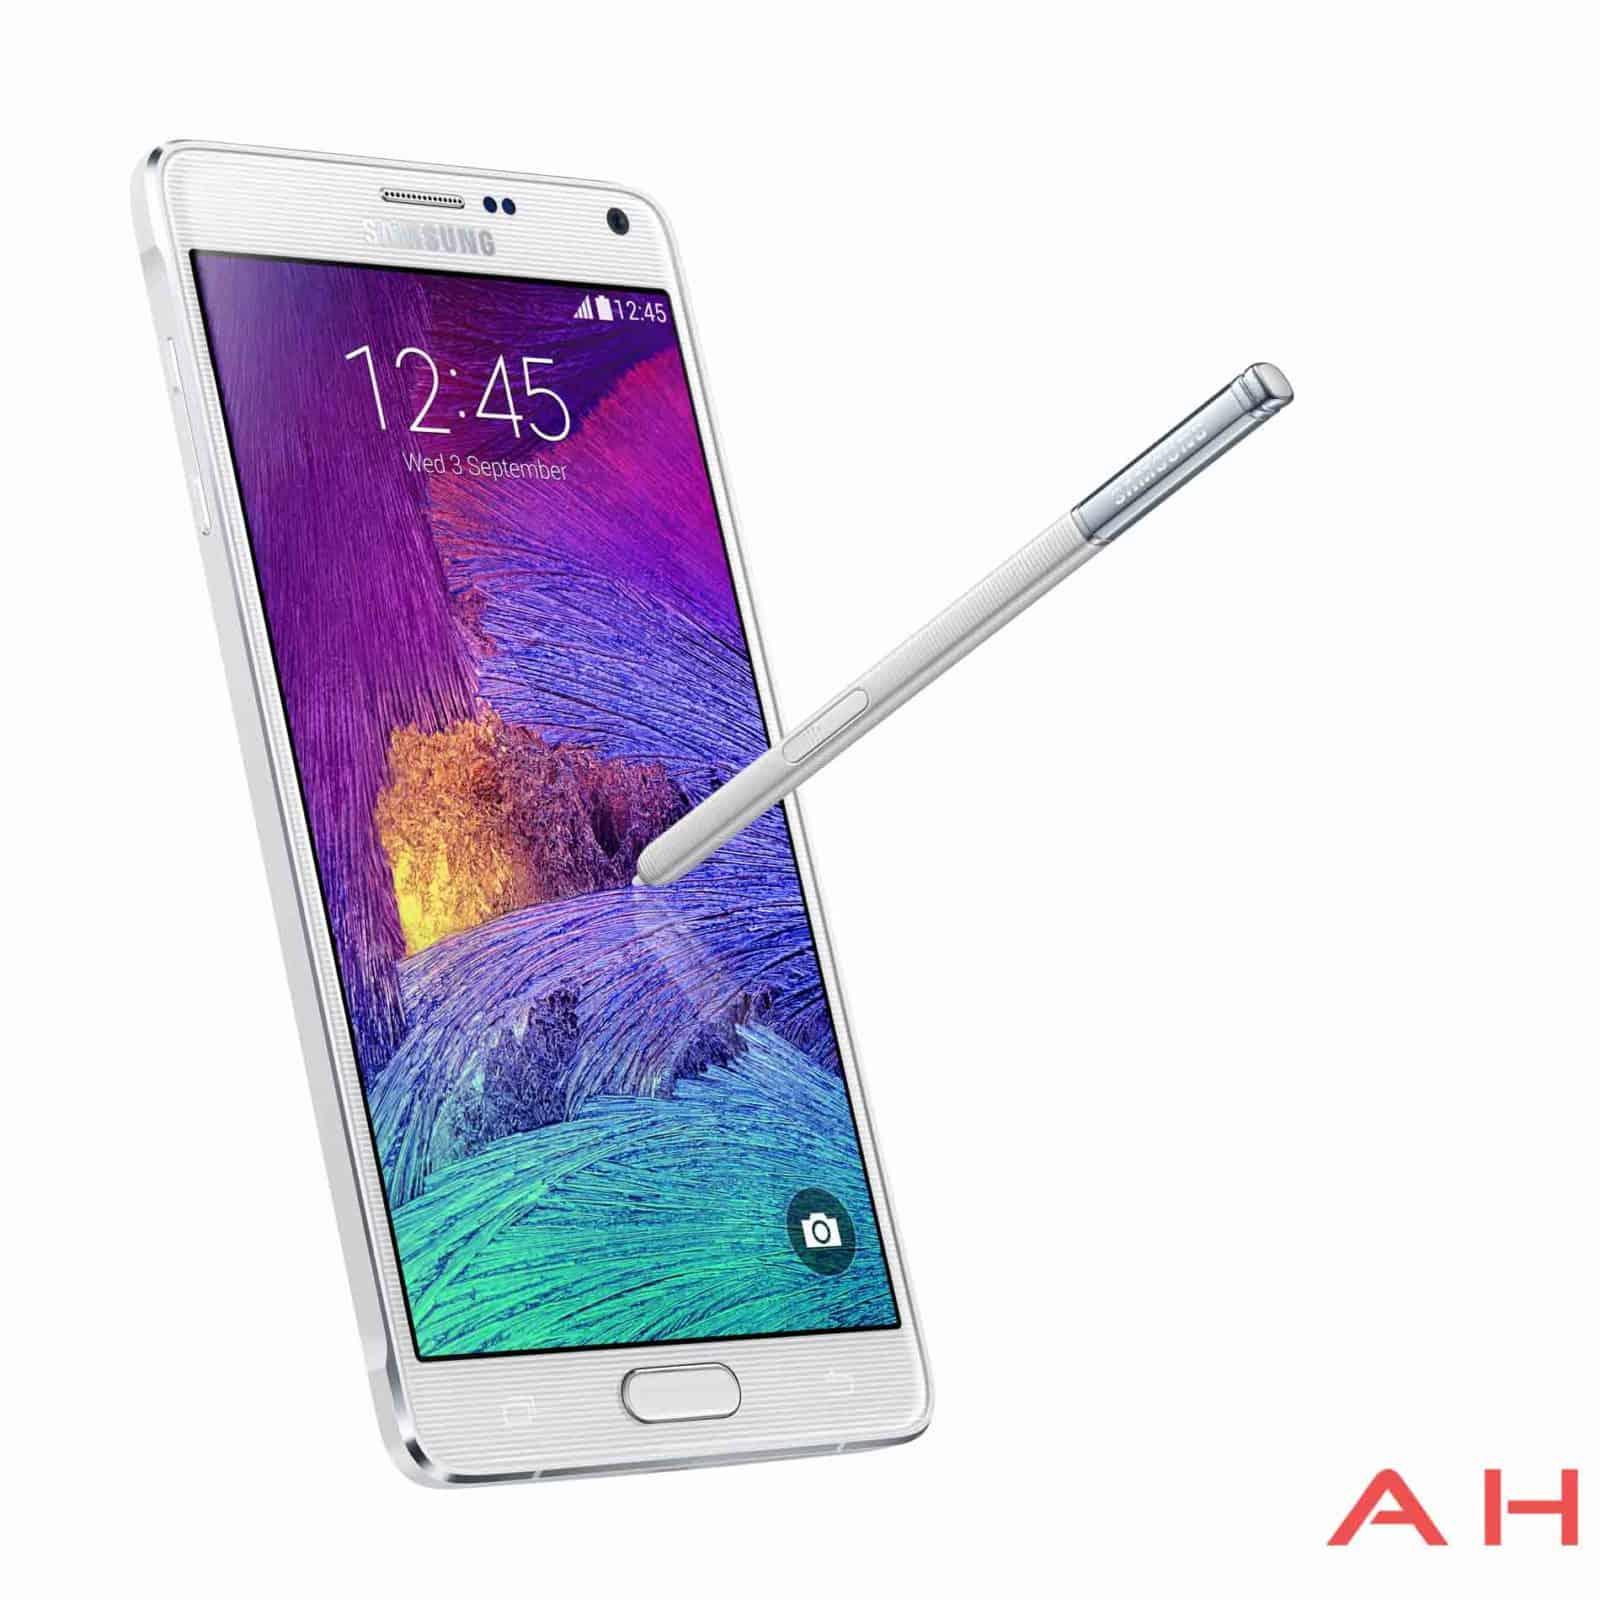 Samsung-Galaxy-Note-4-AH-12